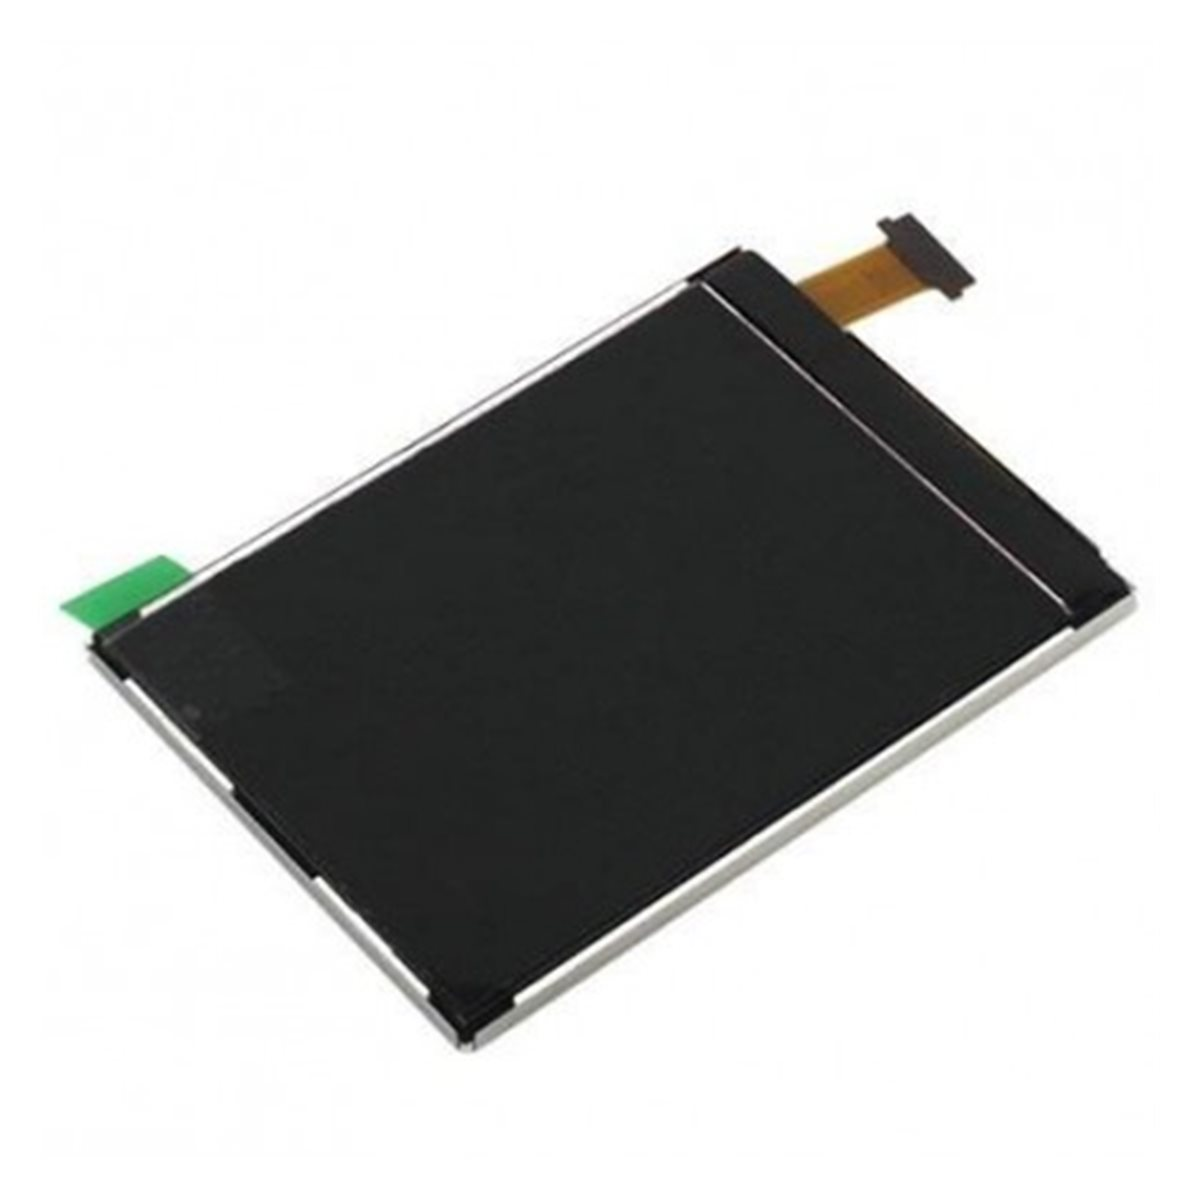 Pantalla (Display) para Nokia 7230 lcd ORIGINAL